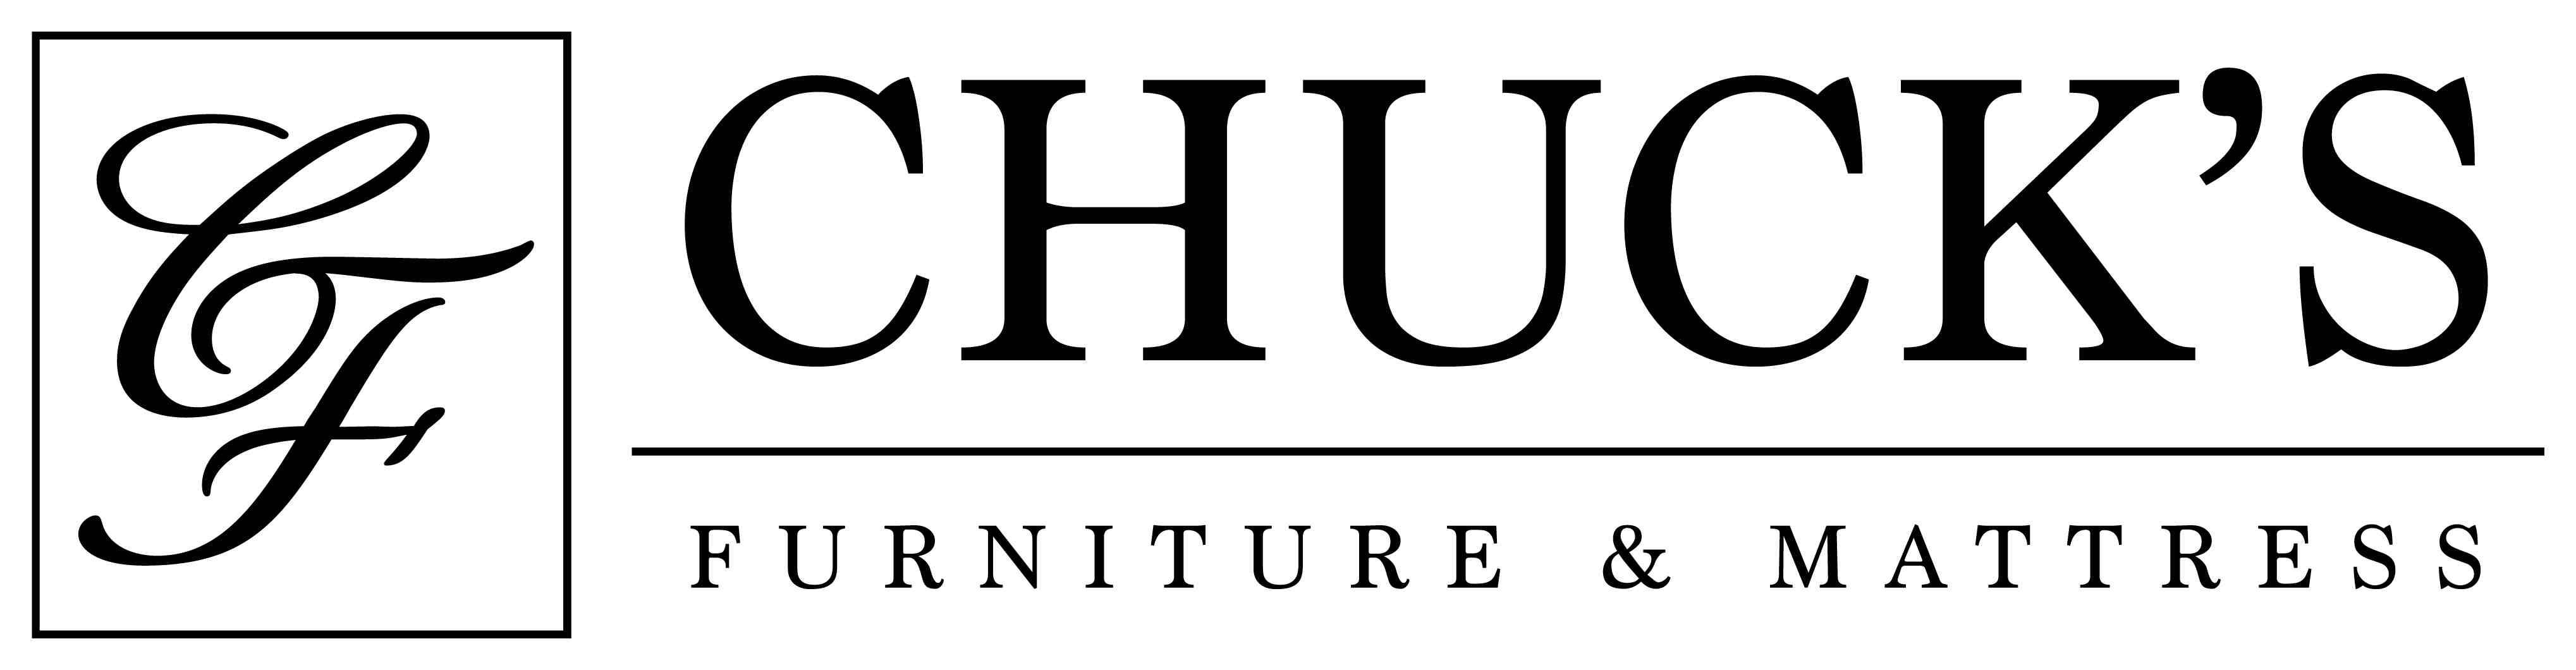 Gentil Chucku0027s Furniture In Morgantown, WV   Mattress Store Reviews | GoodBed.com